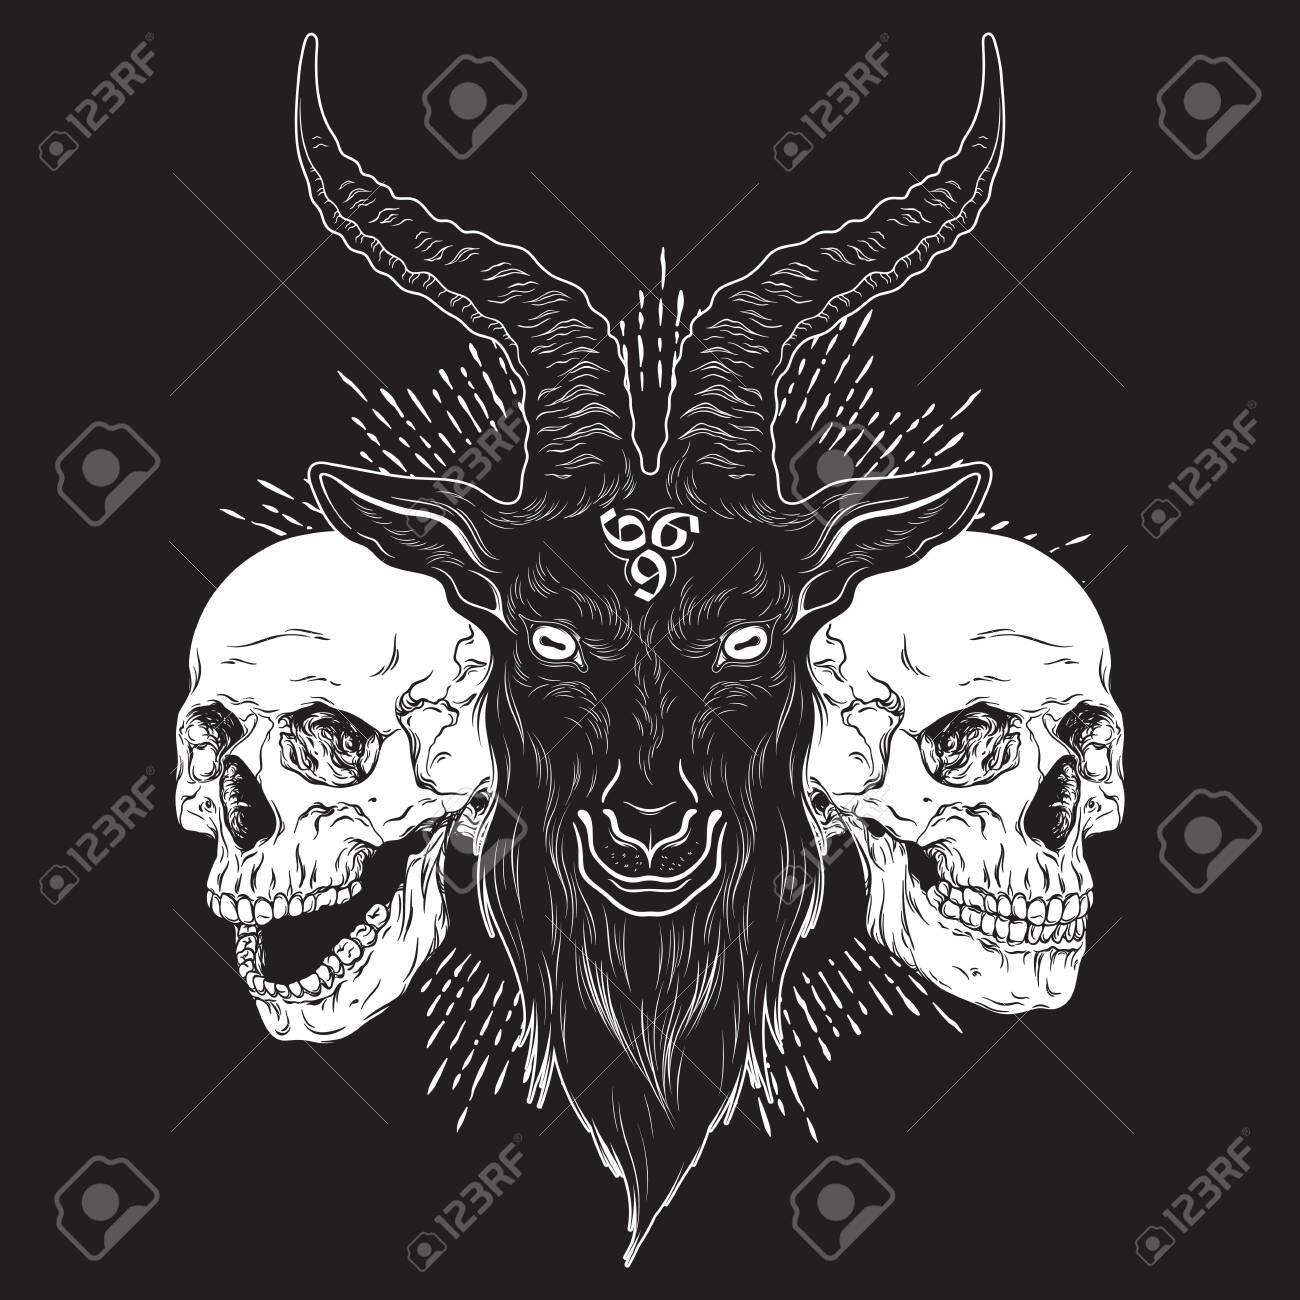 Baphomet demon goat head and human skulls hand drawn print or blackwork flash tattoo art design vector illustration - 145539277